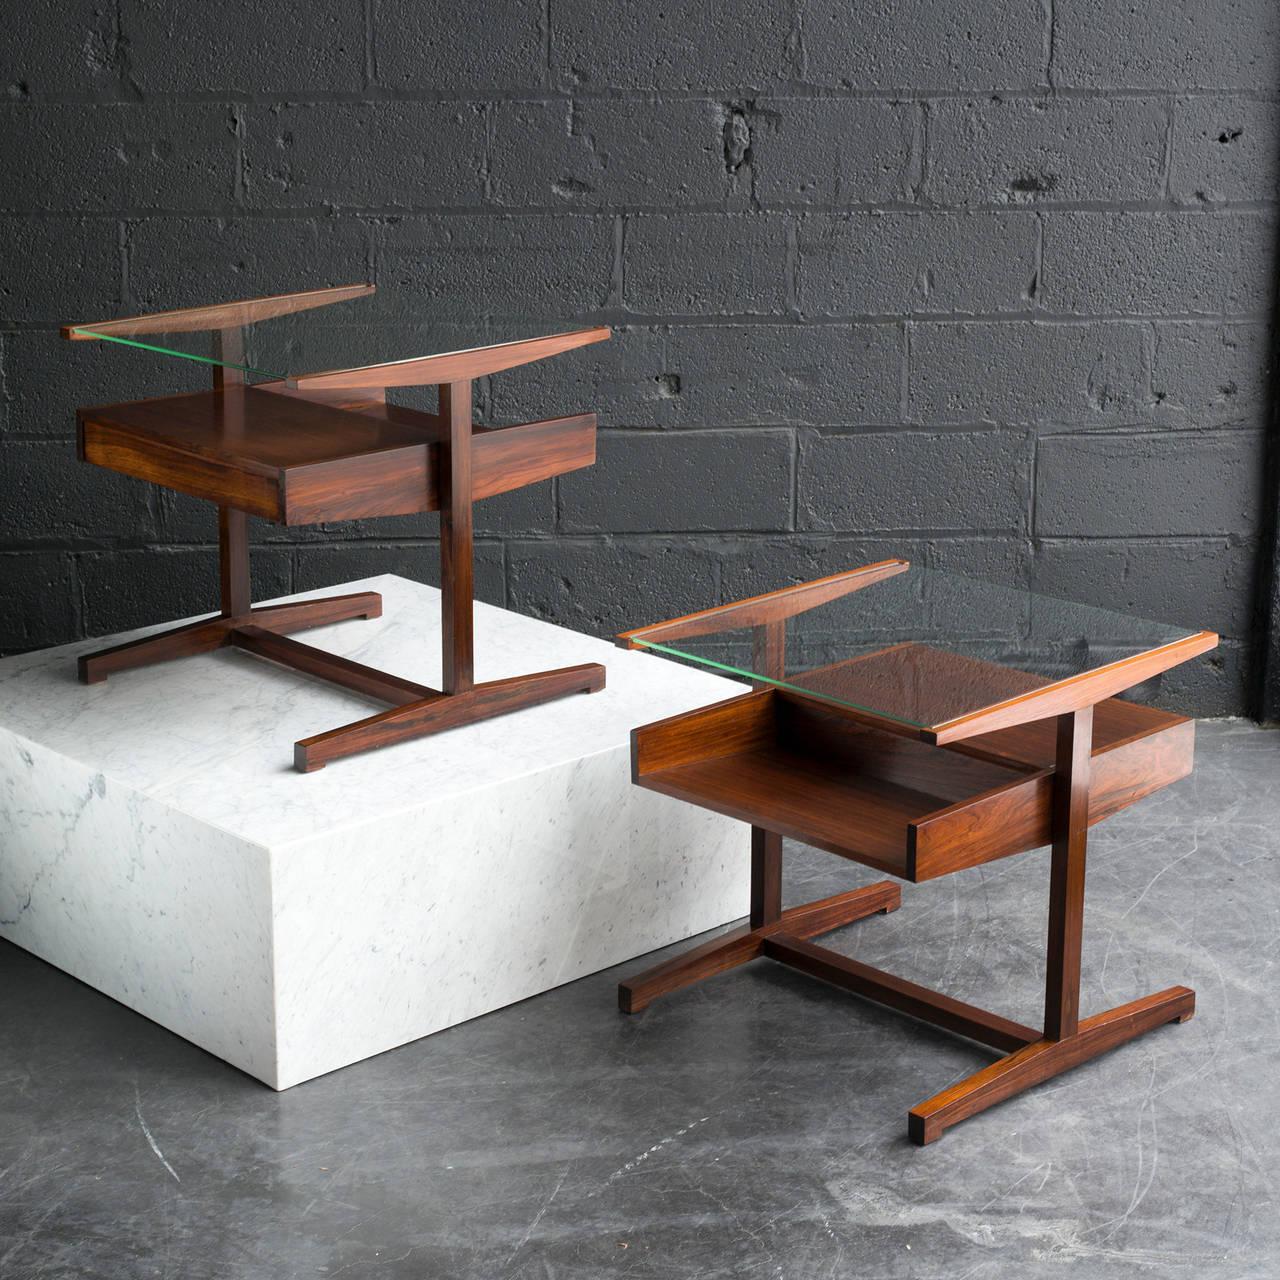 Mid century brazilian end tables at 1stdibs - Brazilian mid century modern furniture ...